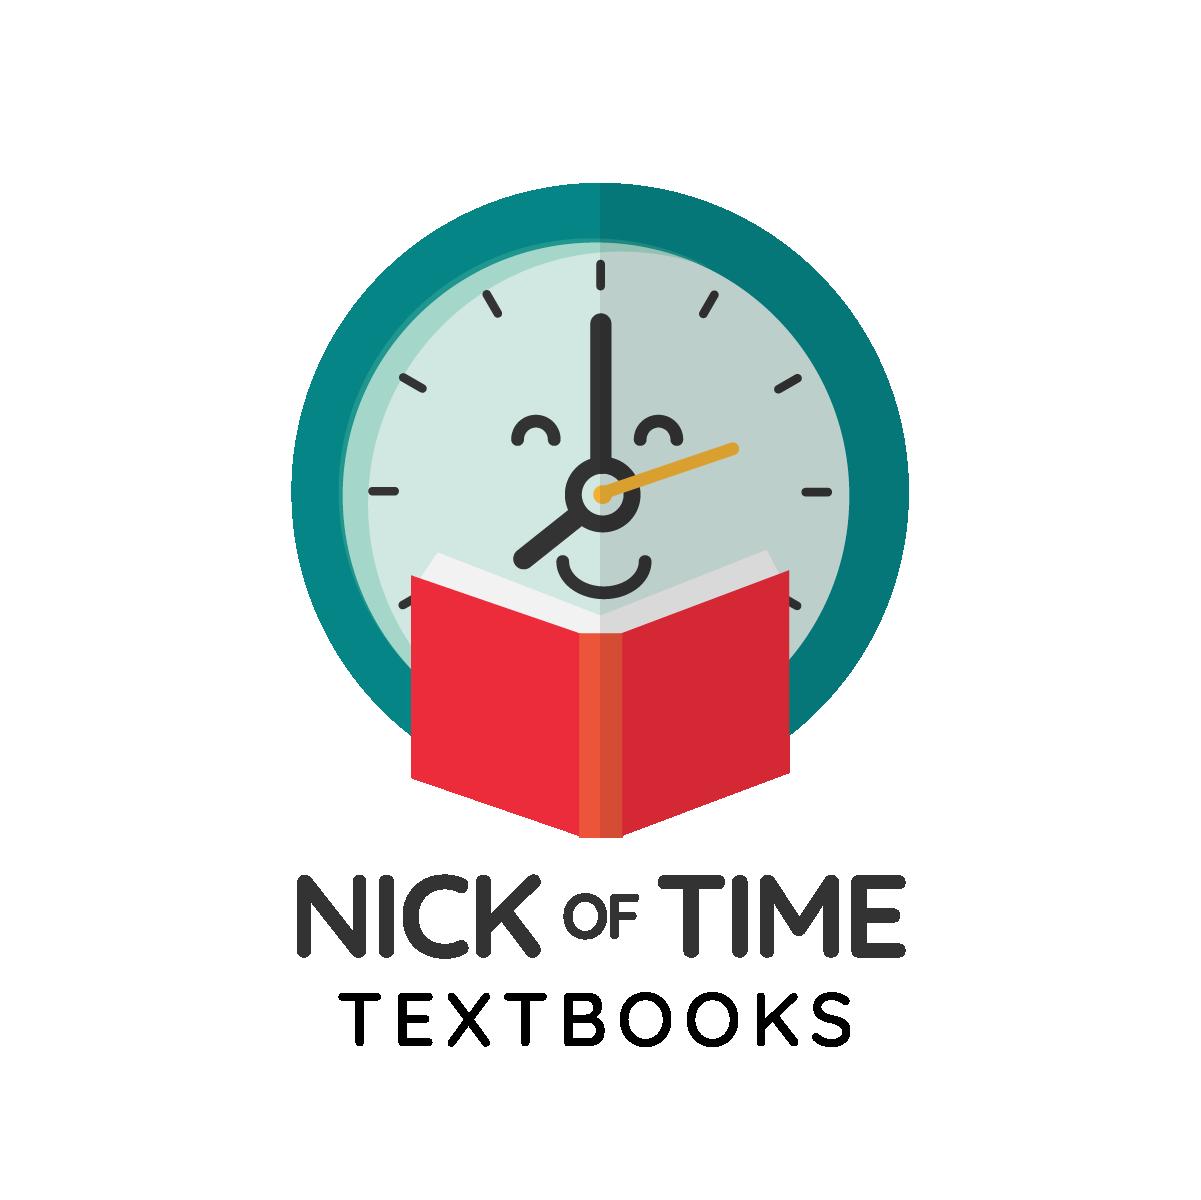 nick-full-logo-black-text-05.png